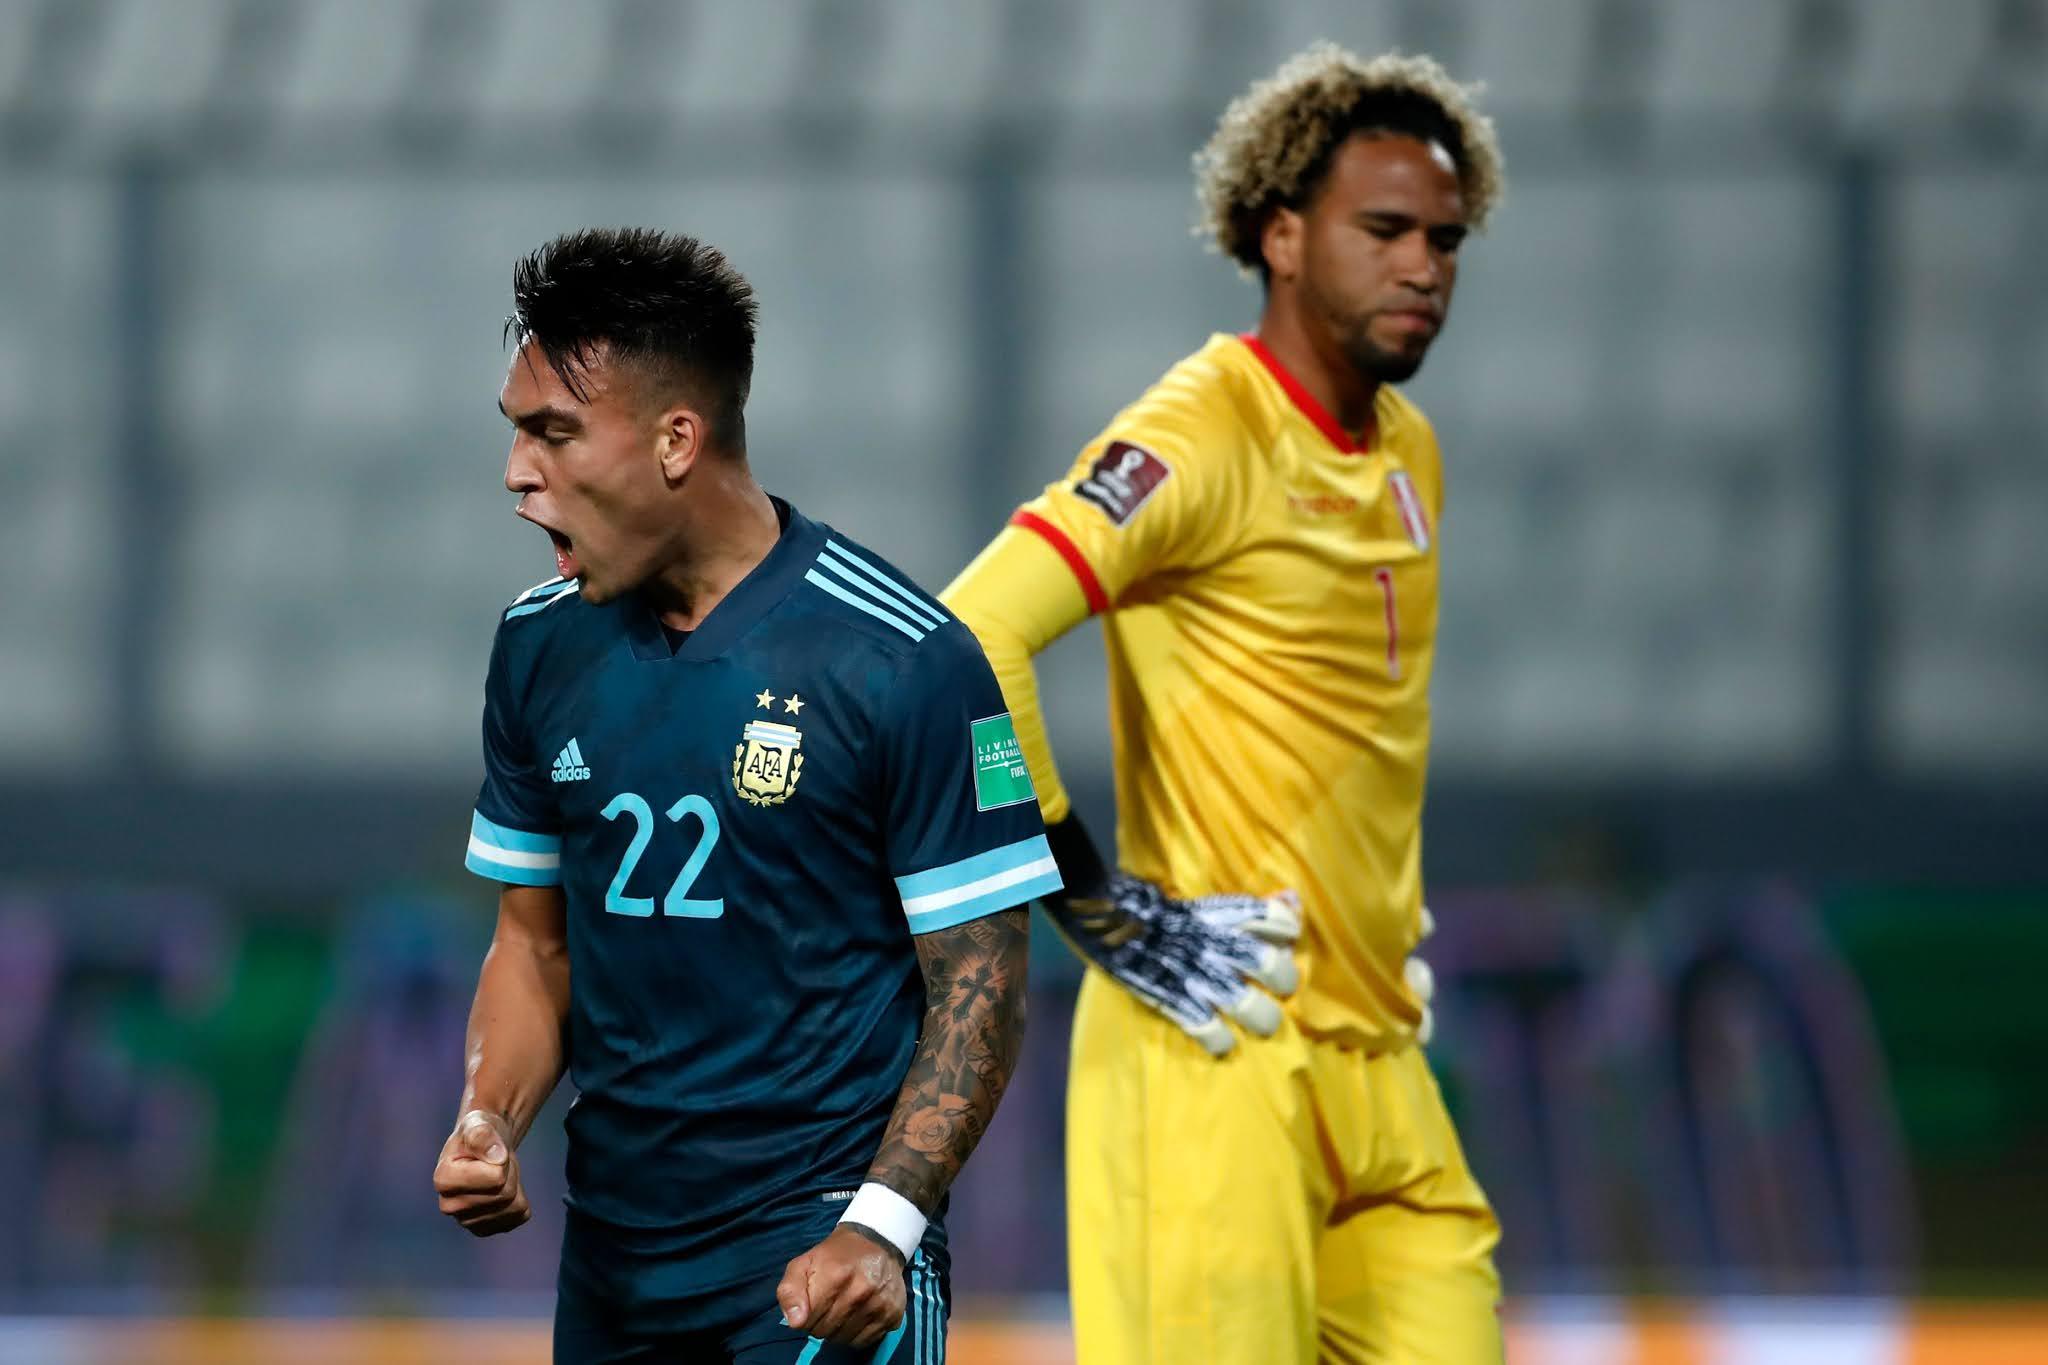 Perú 0-2 Argentina Eliminatorias Sudamericanas